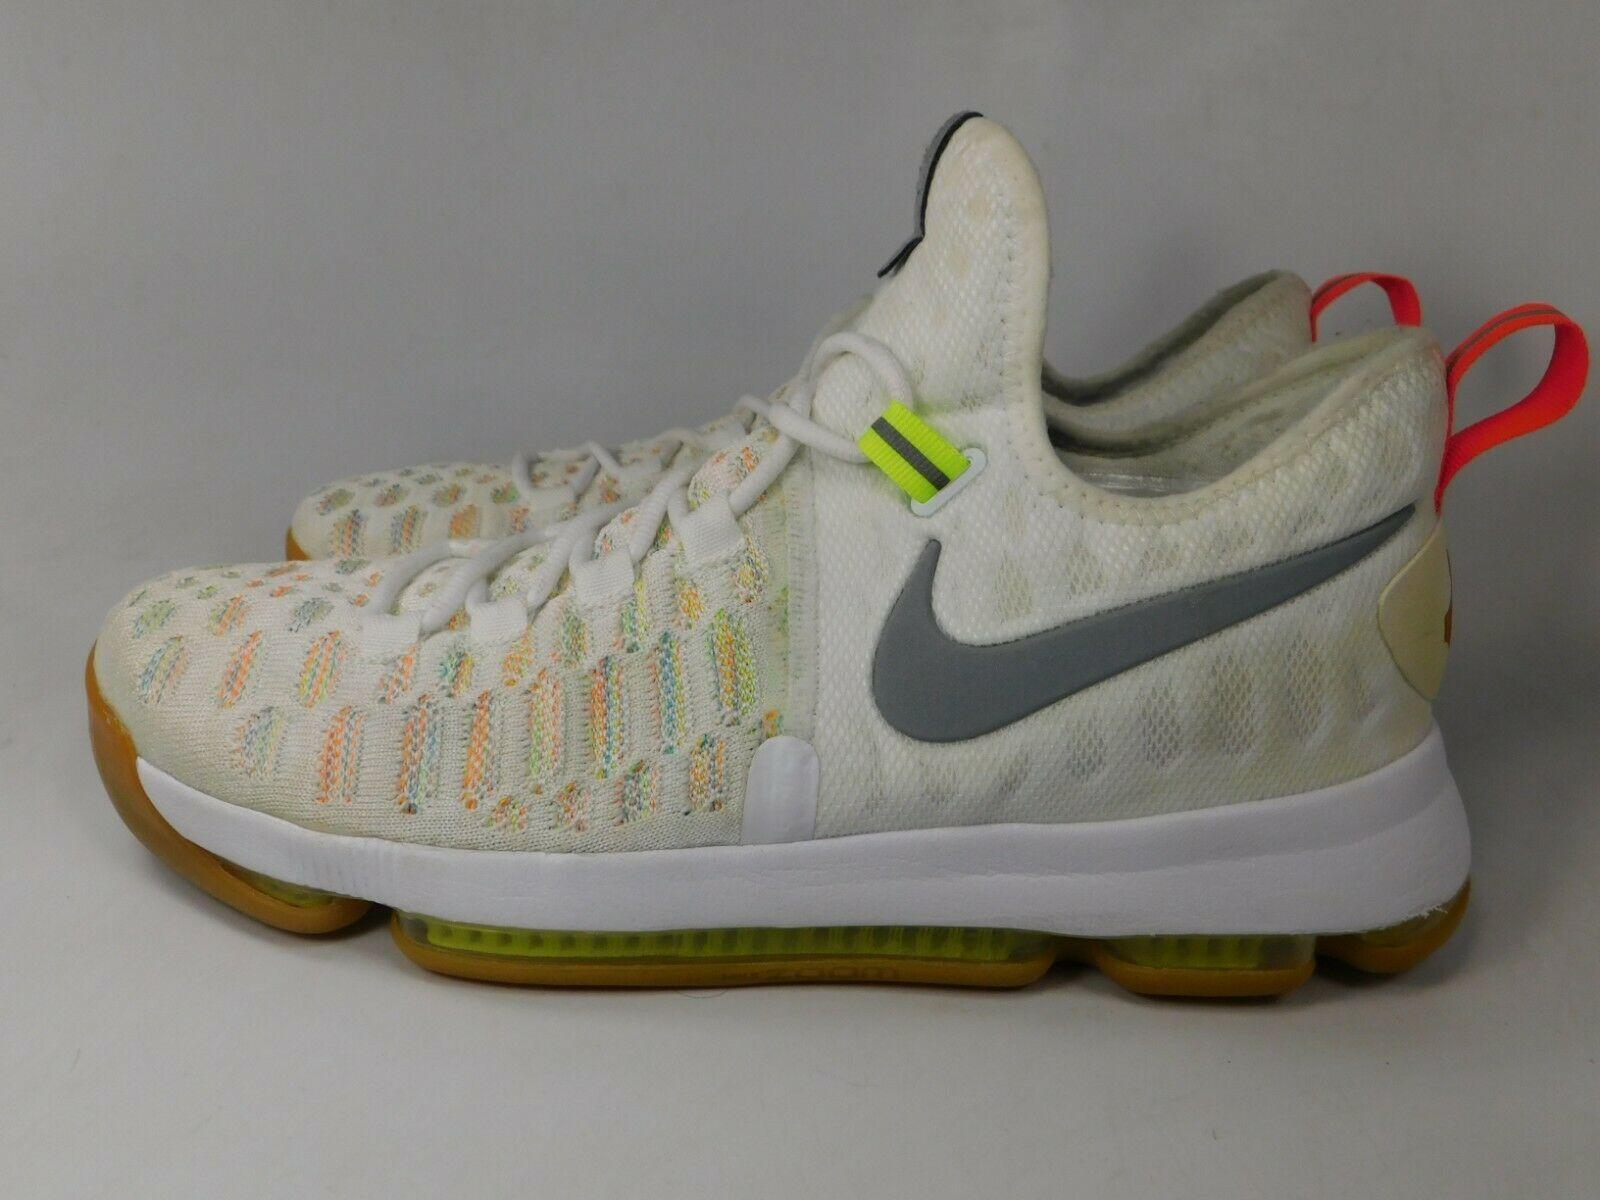 Nike Zoom KD 9 IX Size US 10 M (D) EU 44 Men's Basketball Shoes Multi 843392-900 image 3